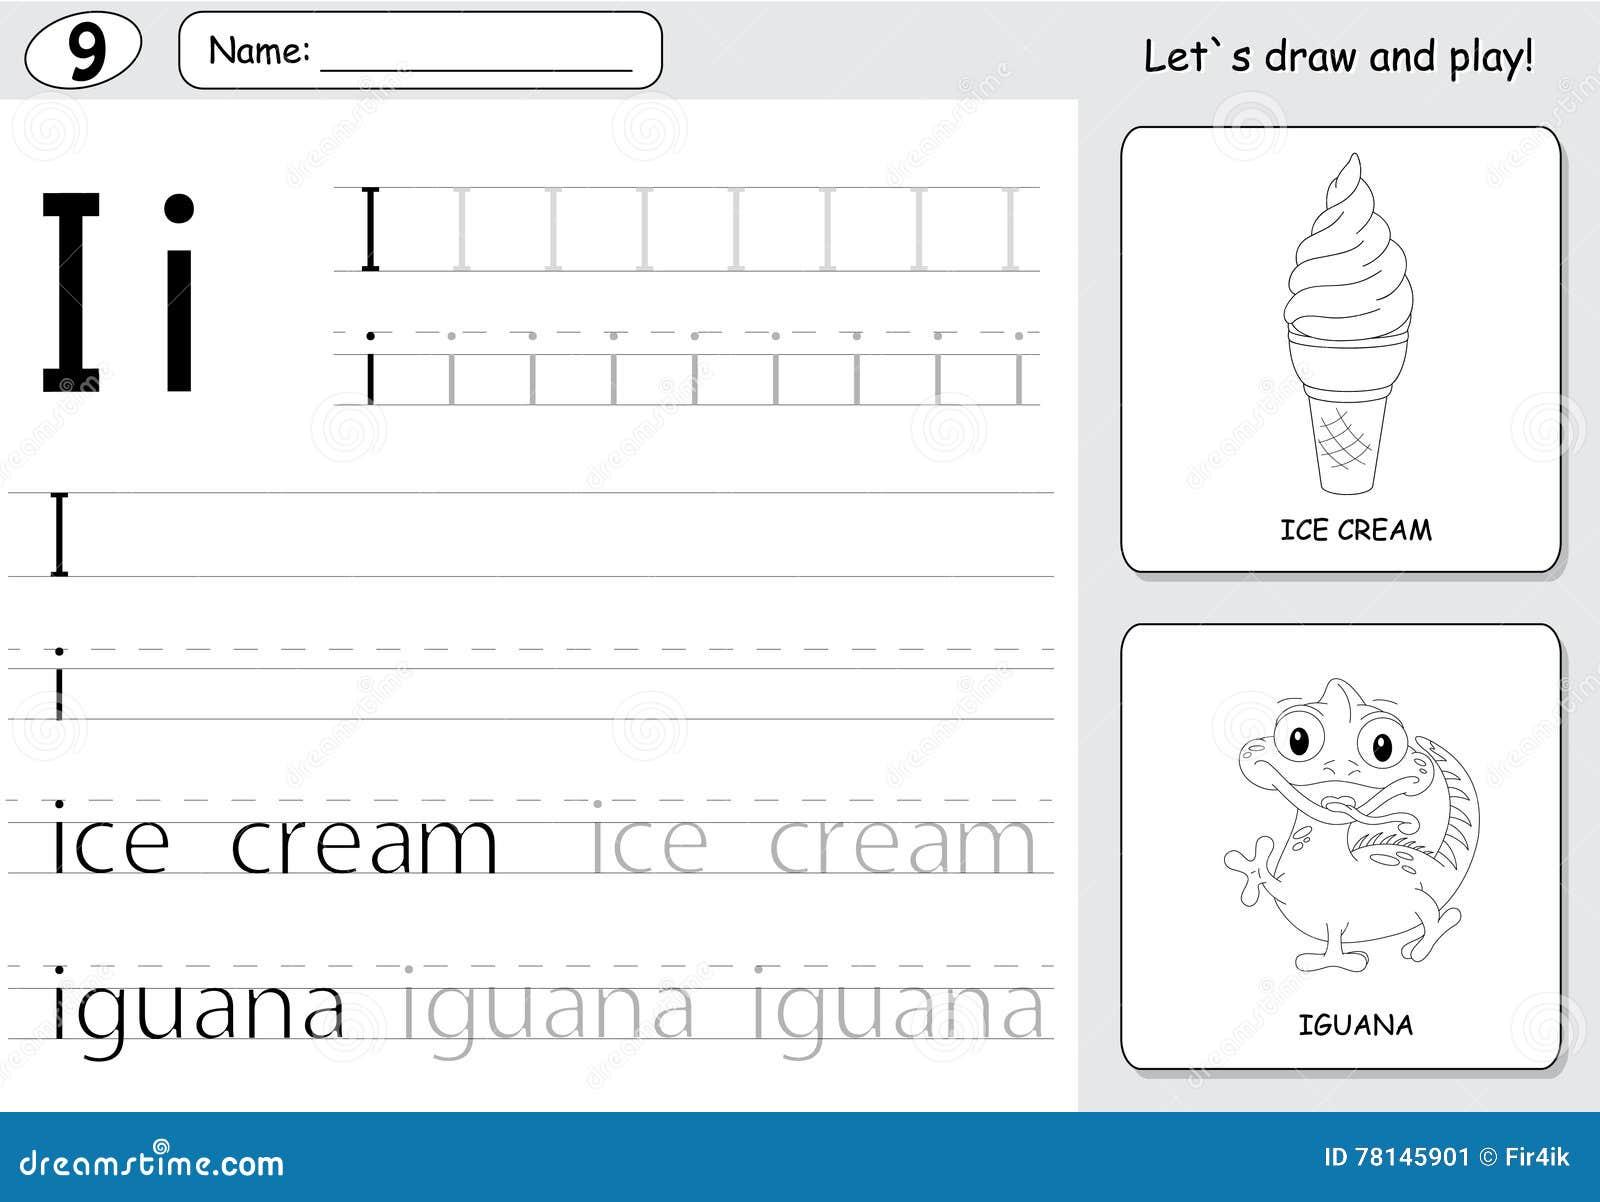 ice cream writing worksheets for kindergarten ice best free printable worksheets. Black Bedroom Furniture Sets. Home Design Ideas